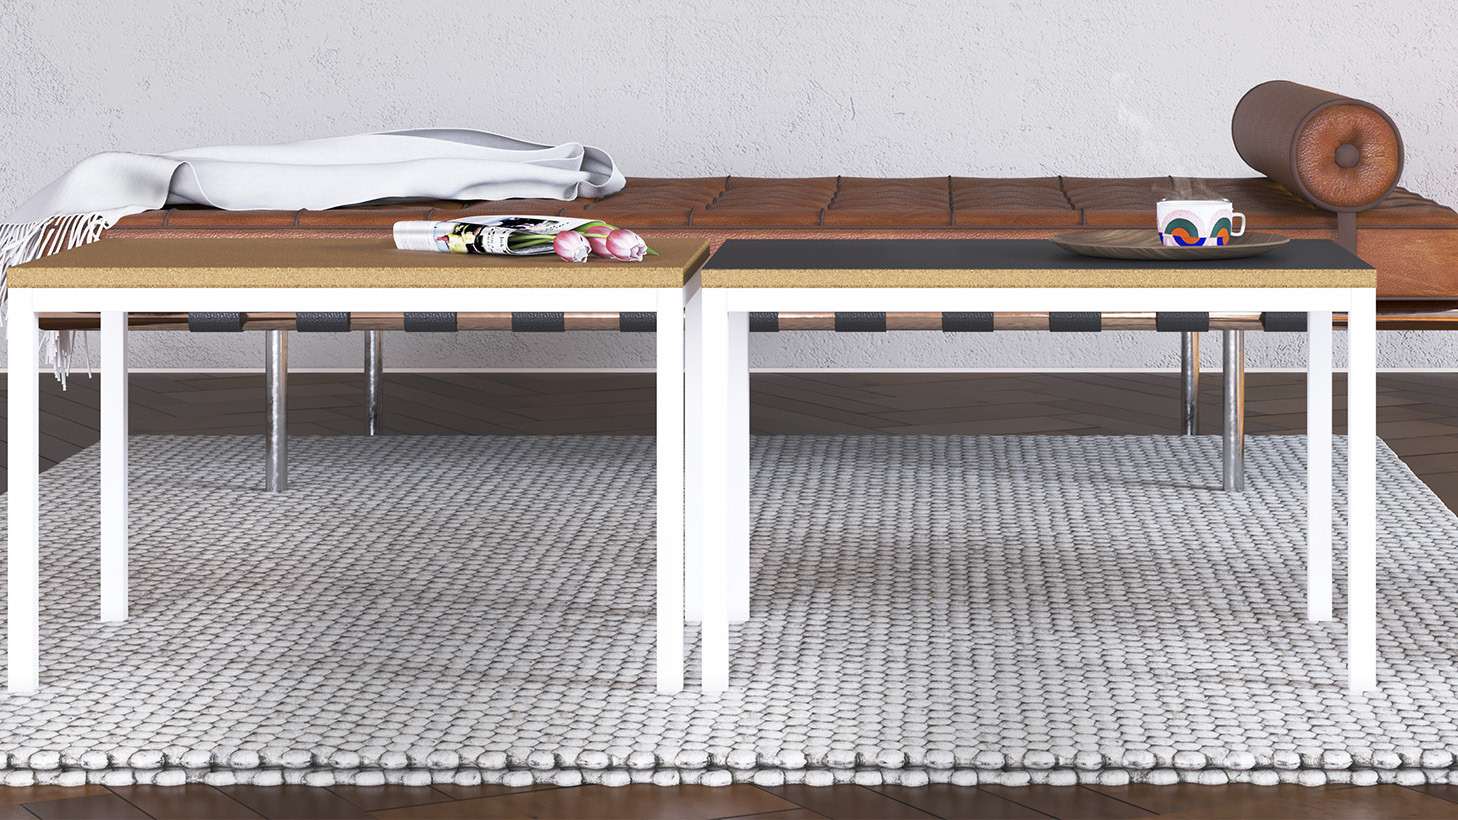 Bord & bordsskivor